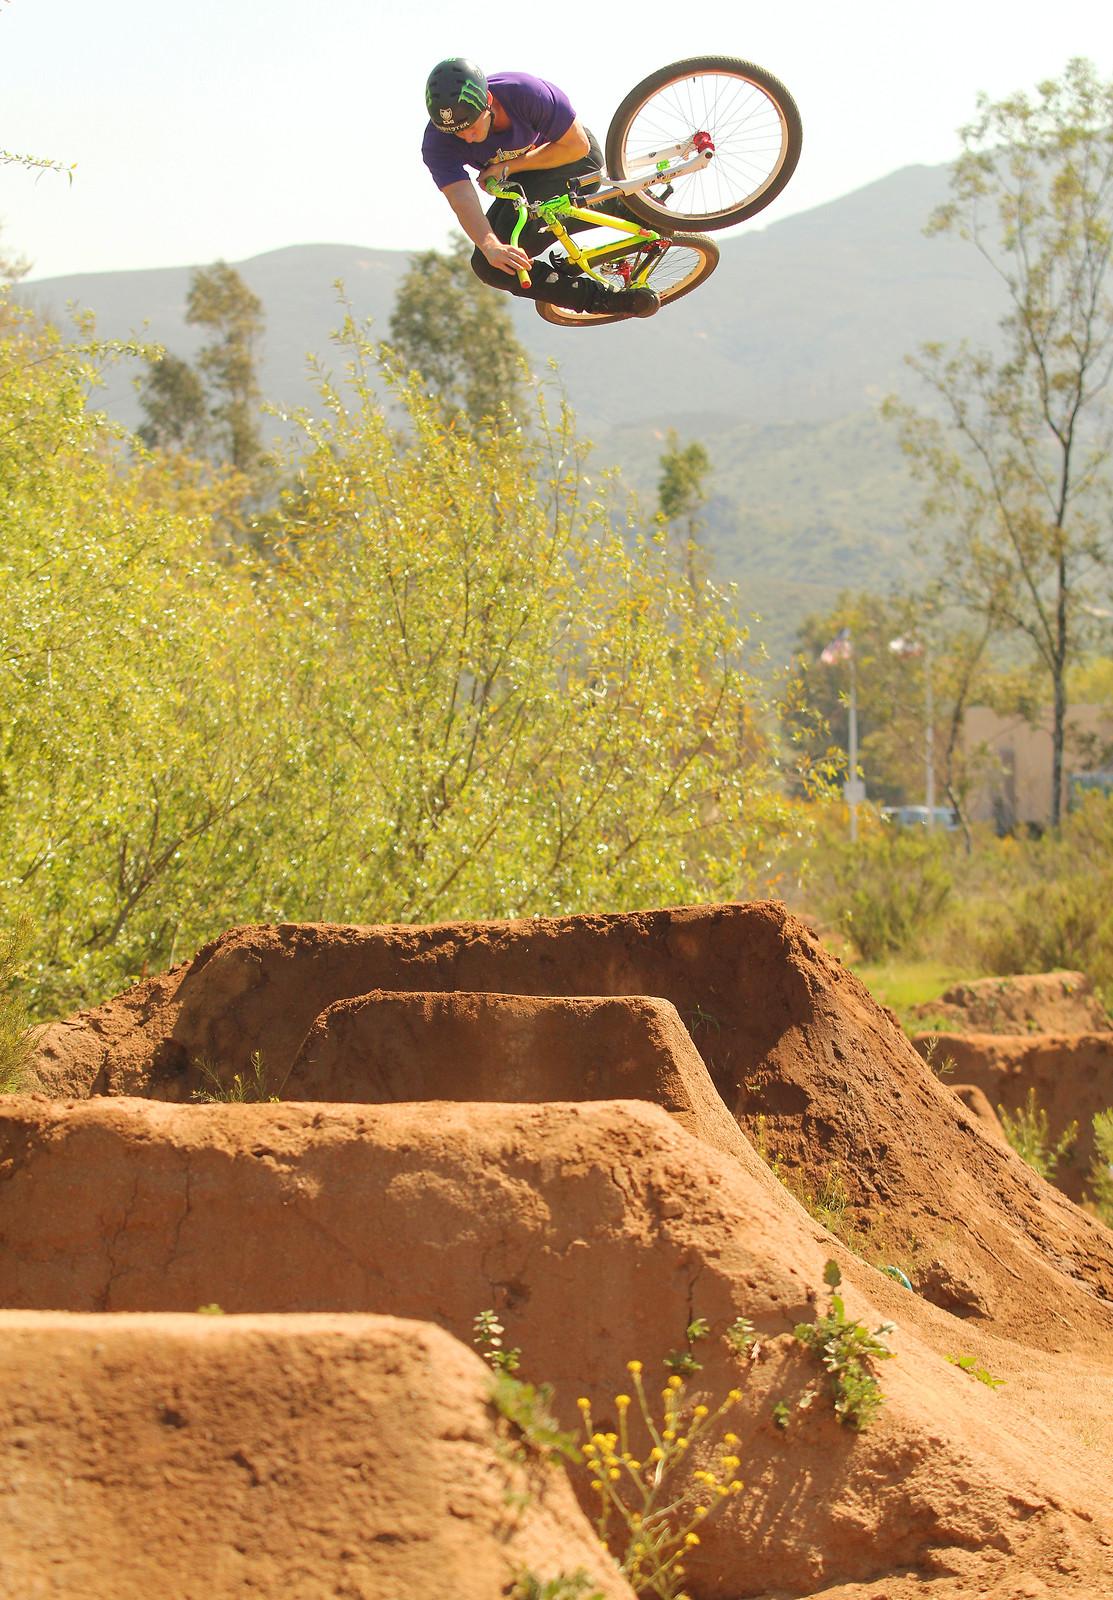 Sam Pilgrim - 3 Table  - SamDavies - Mountain Biking Pictures - Vital MTB